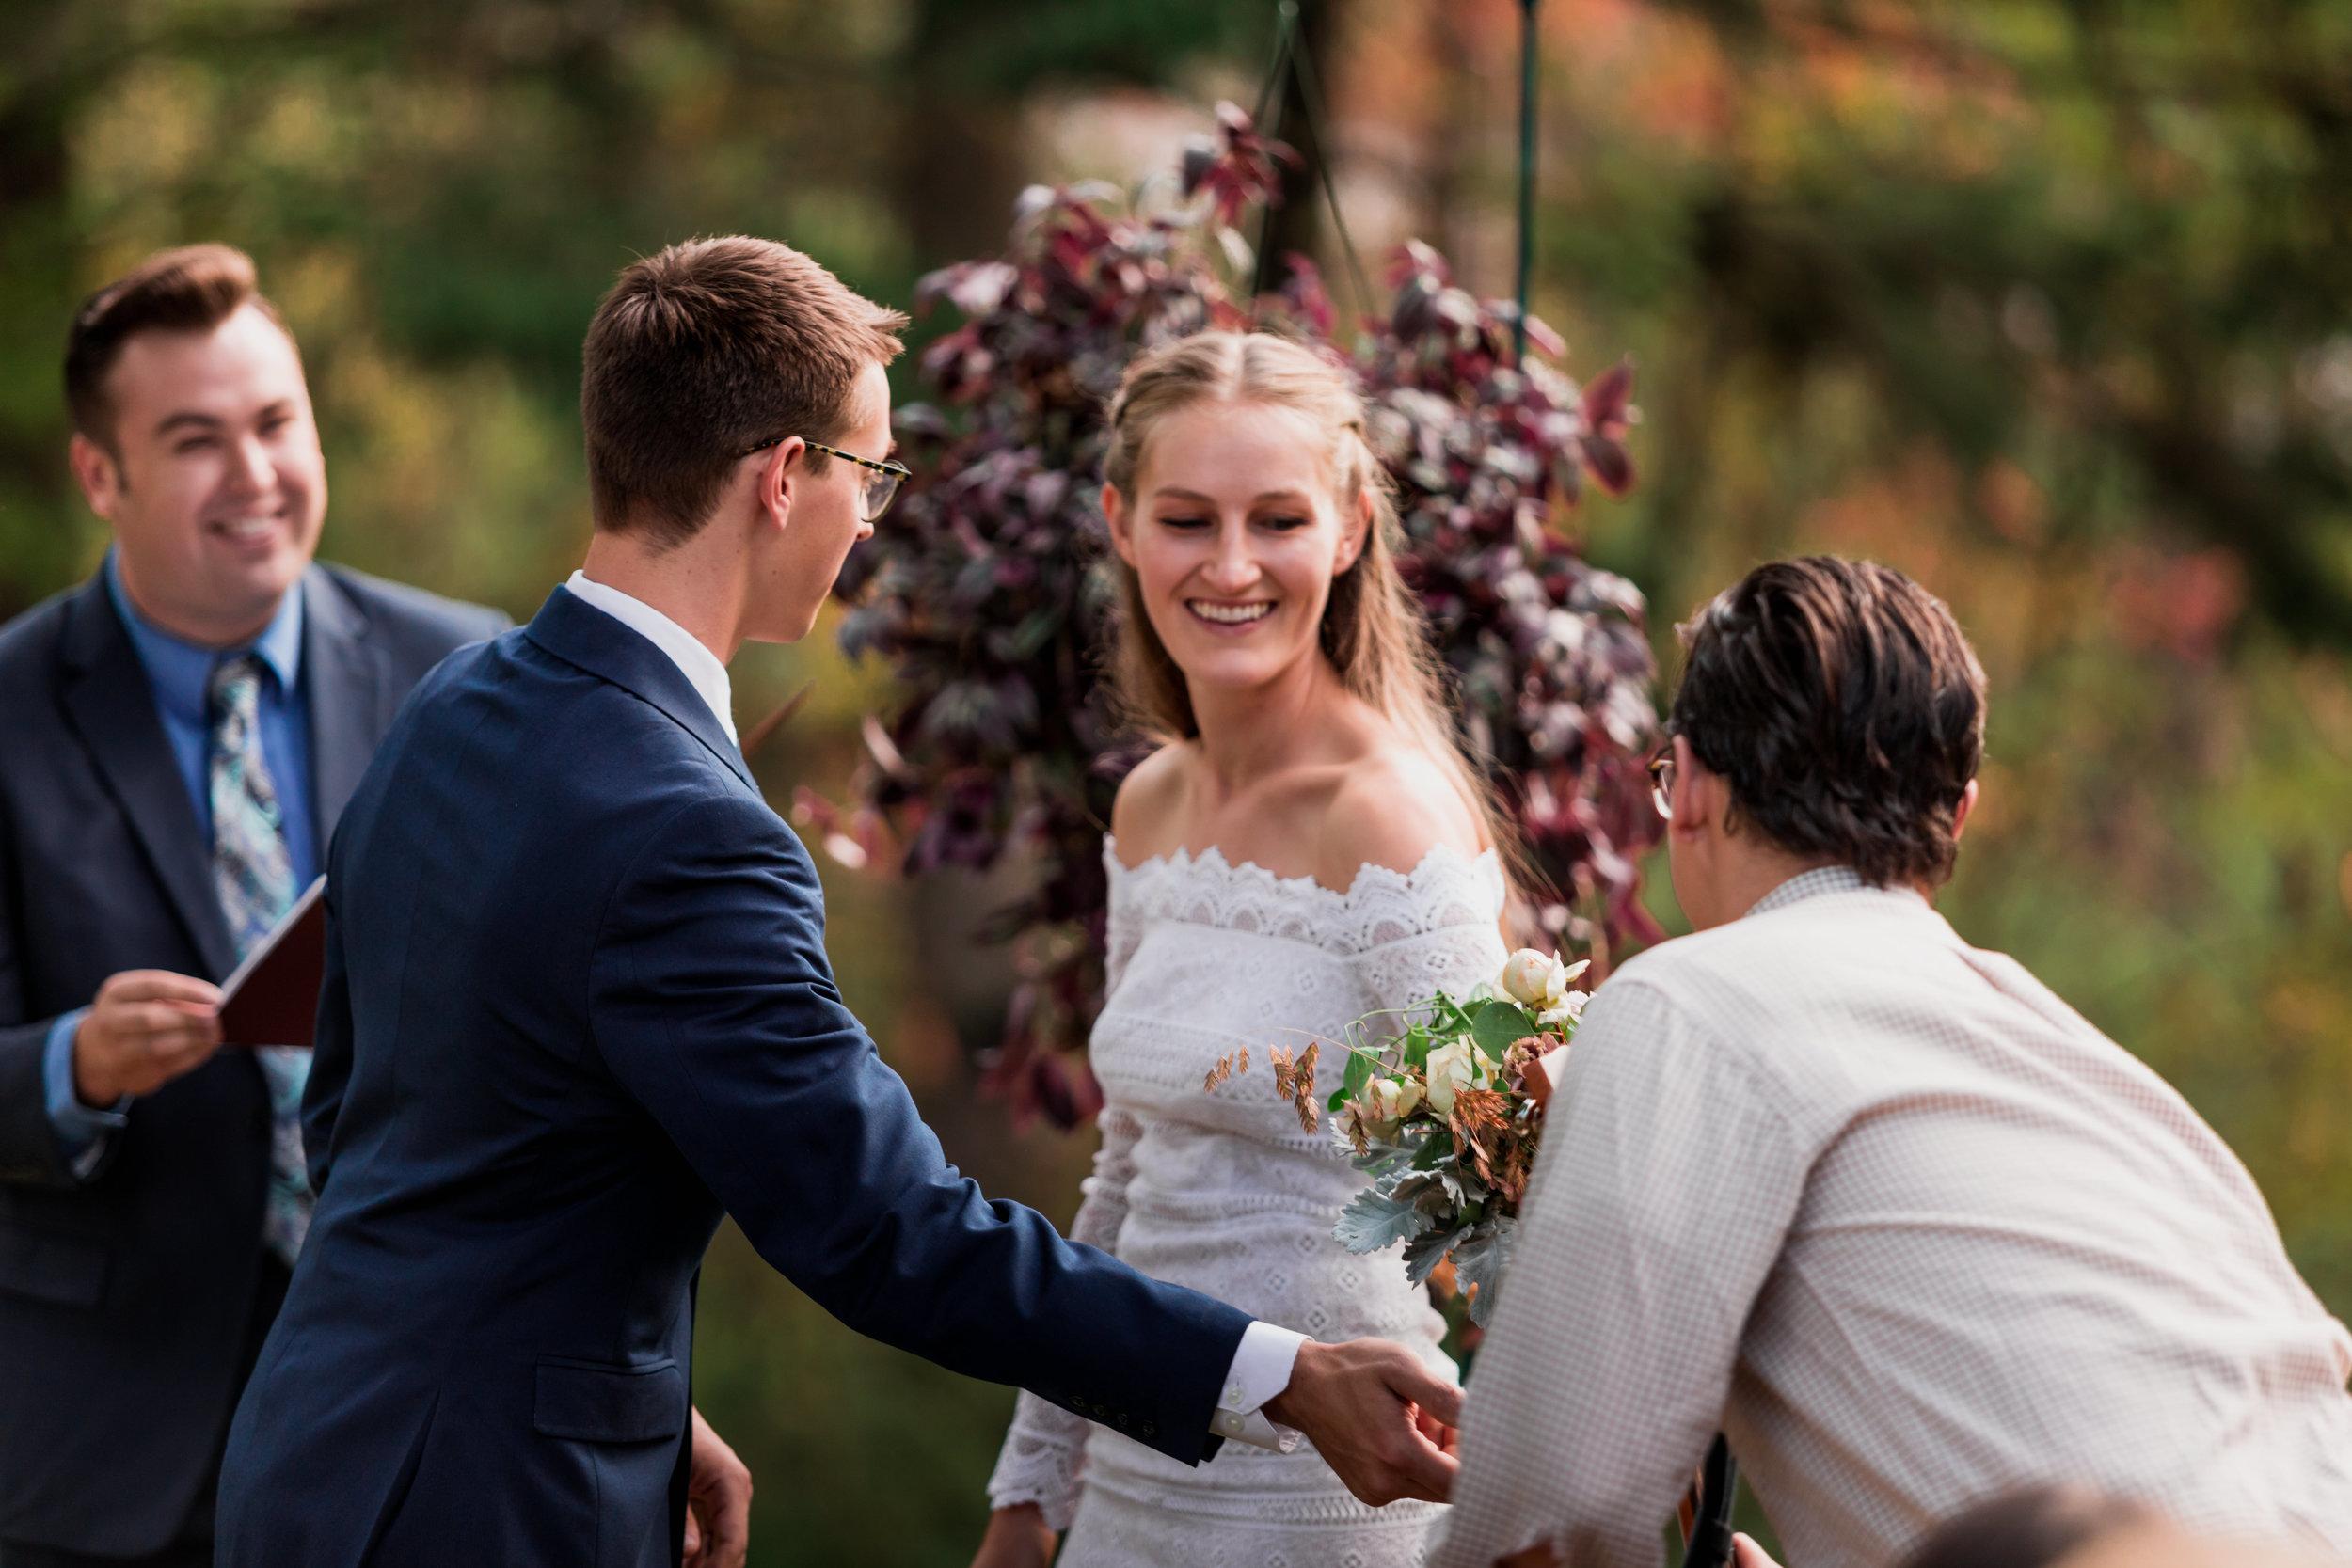 vild-photography-photographer-tahoe-intimate-wedding-adventure-van-abigail-28.jpg